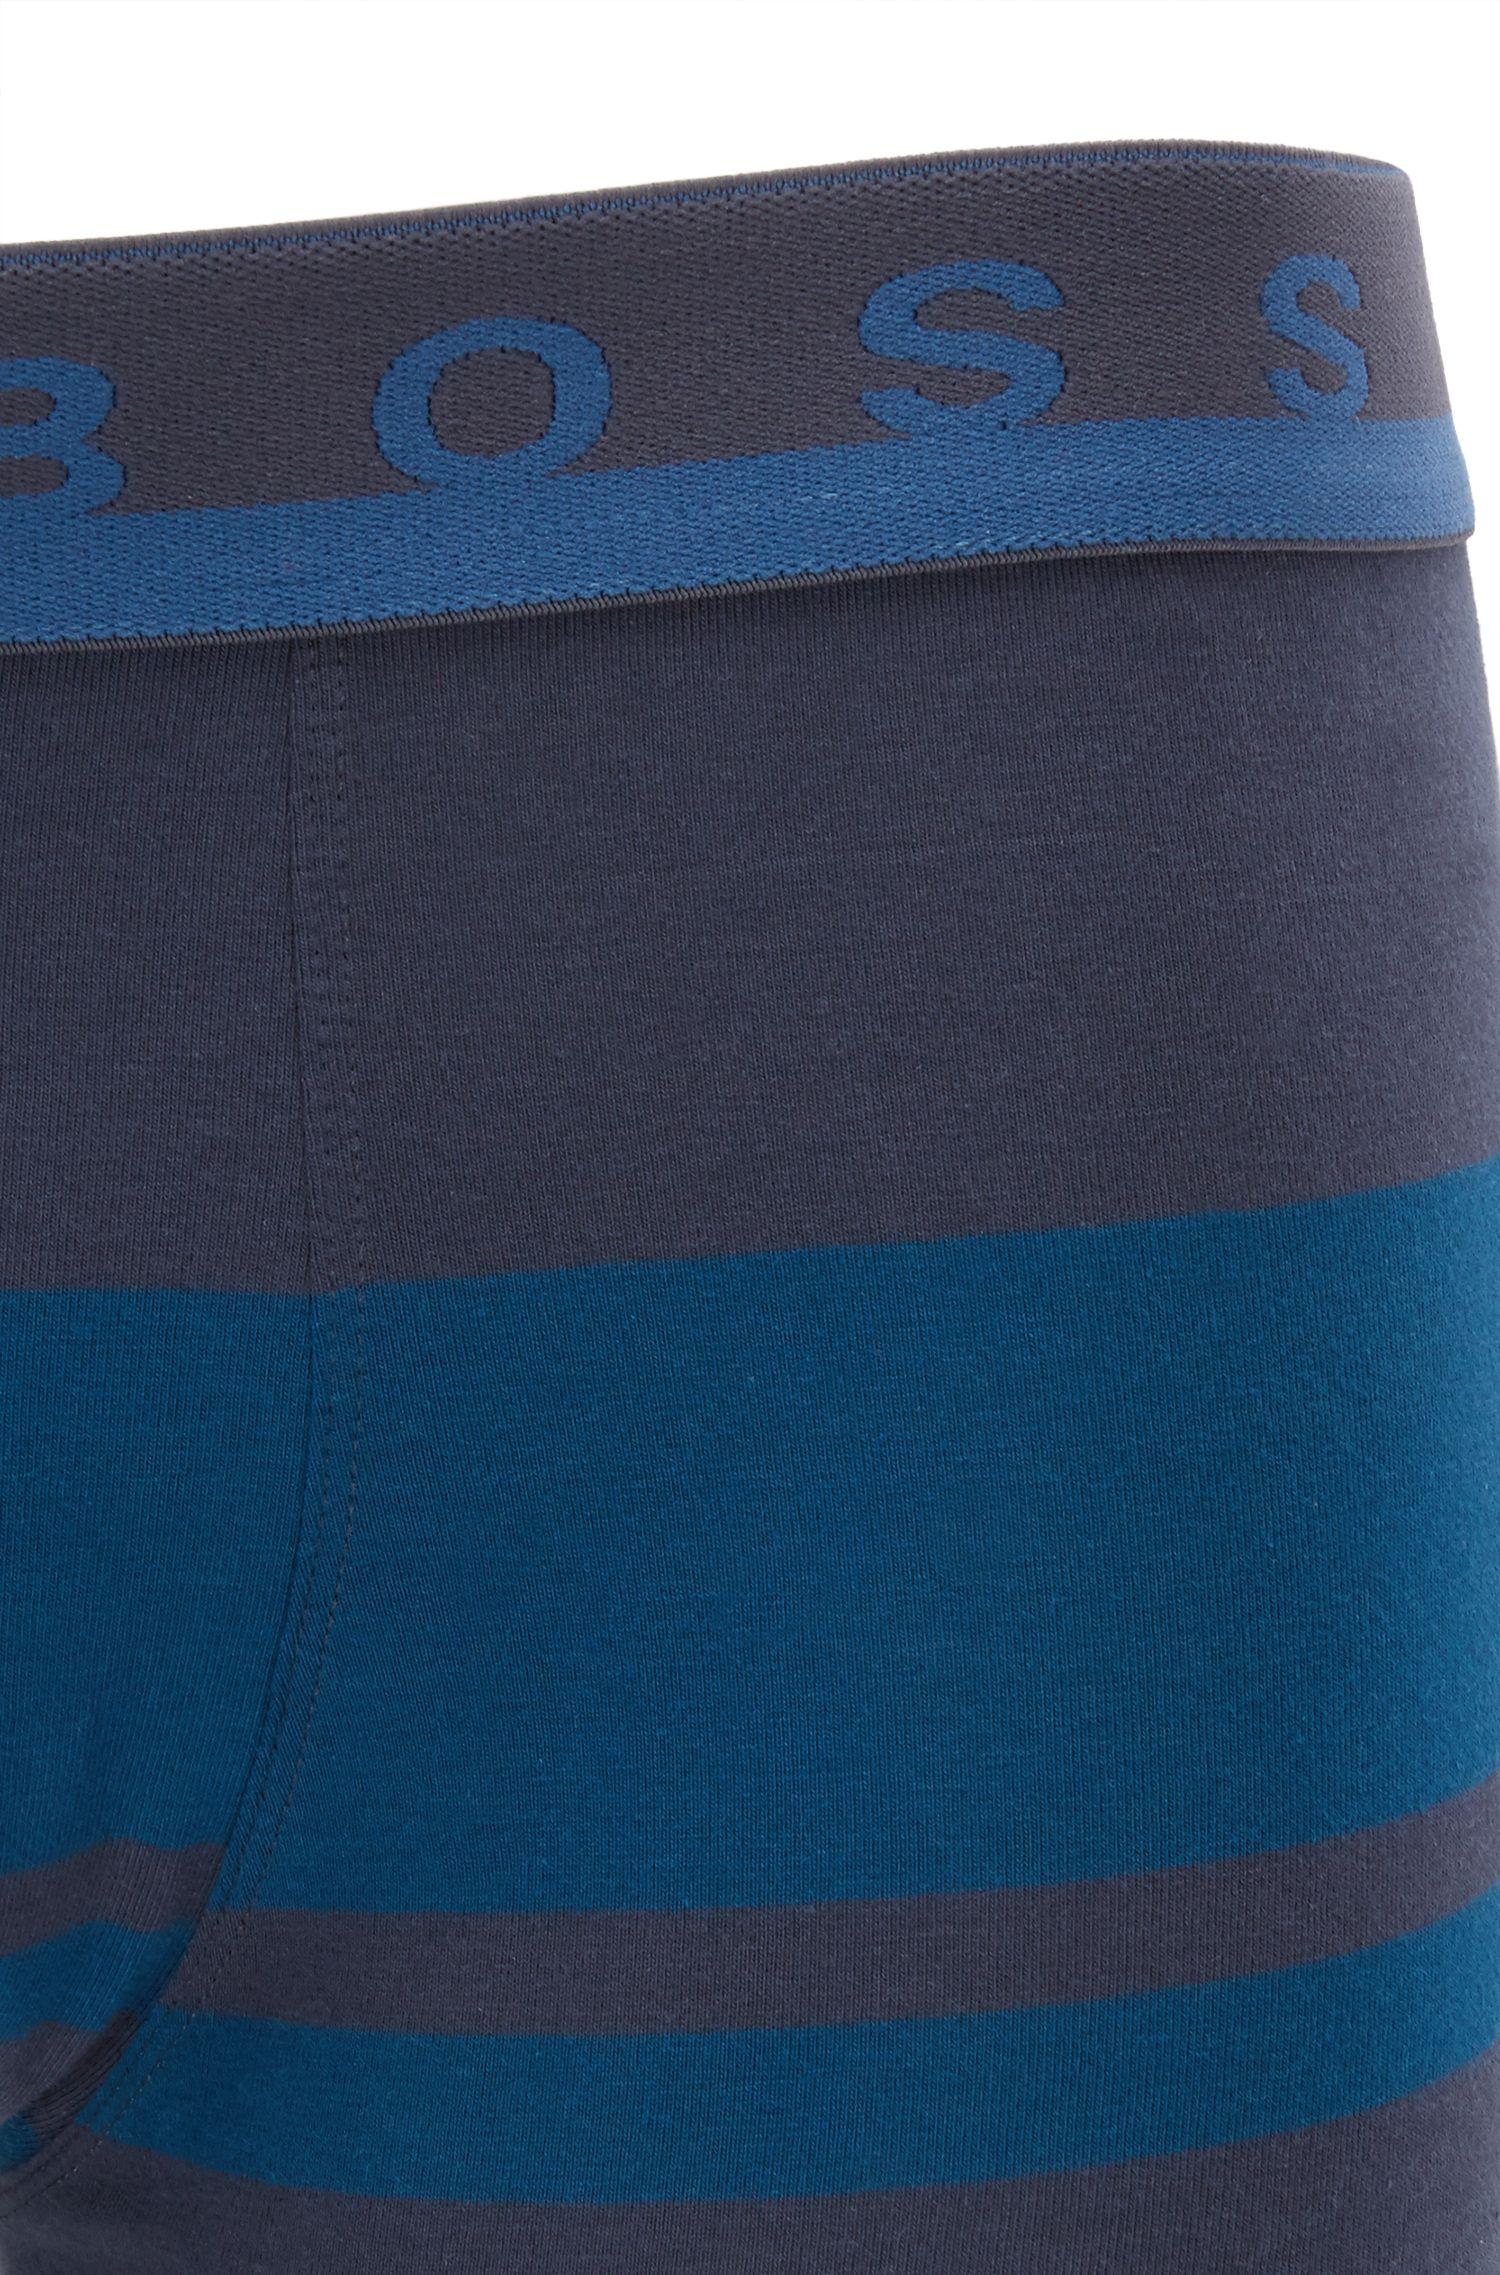 Striped Stretch Cotton Jersey Trunk | Trunk Stripe